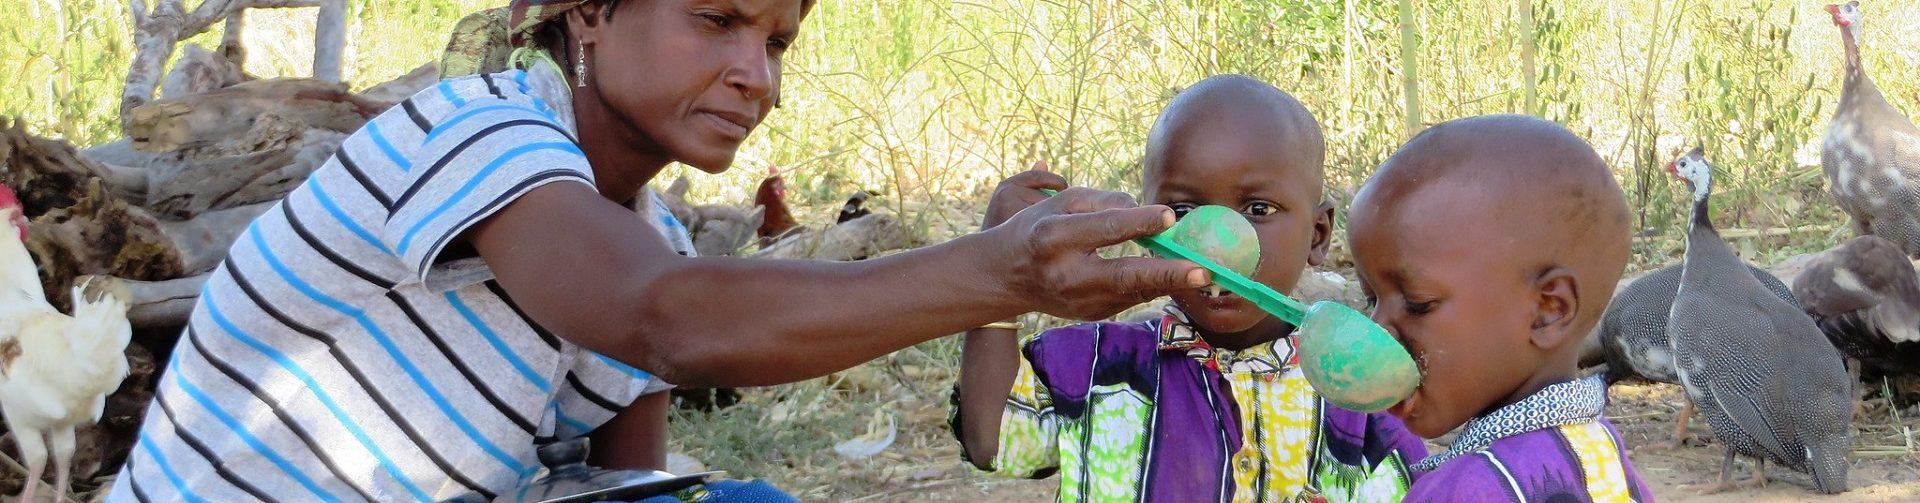 Integrated cash transfer programs in West Africa: How to make cash transfer programs more nutrition sensitive?